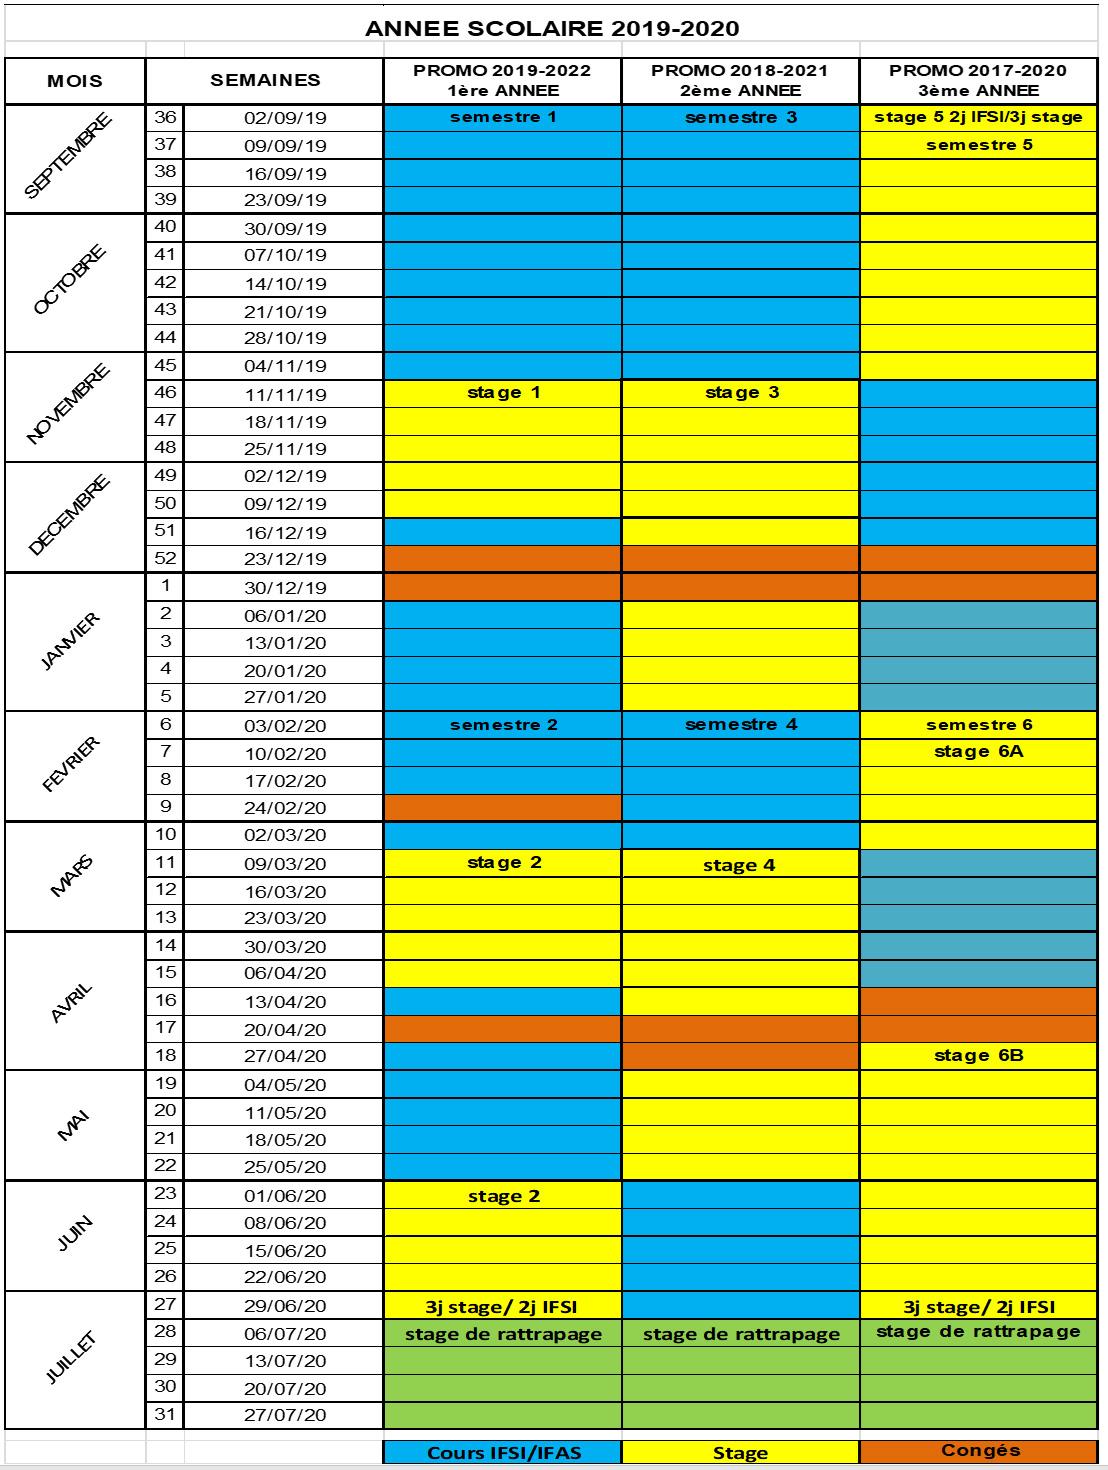 Tableau - IFSI année scolaire 2019-2020